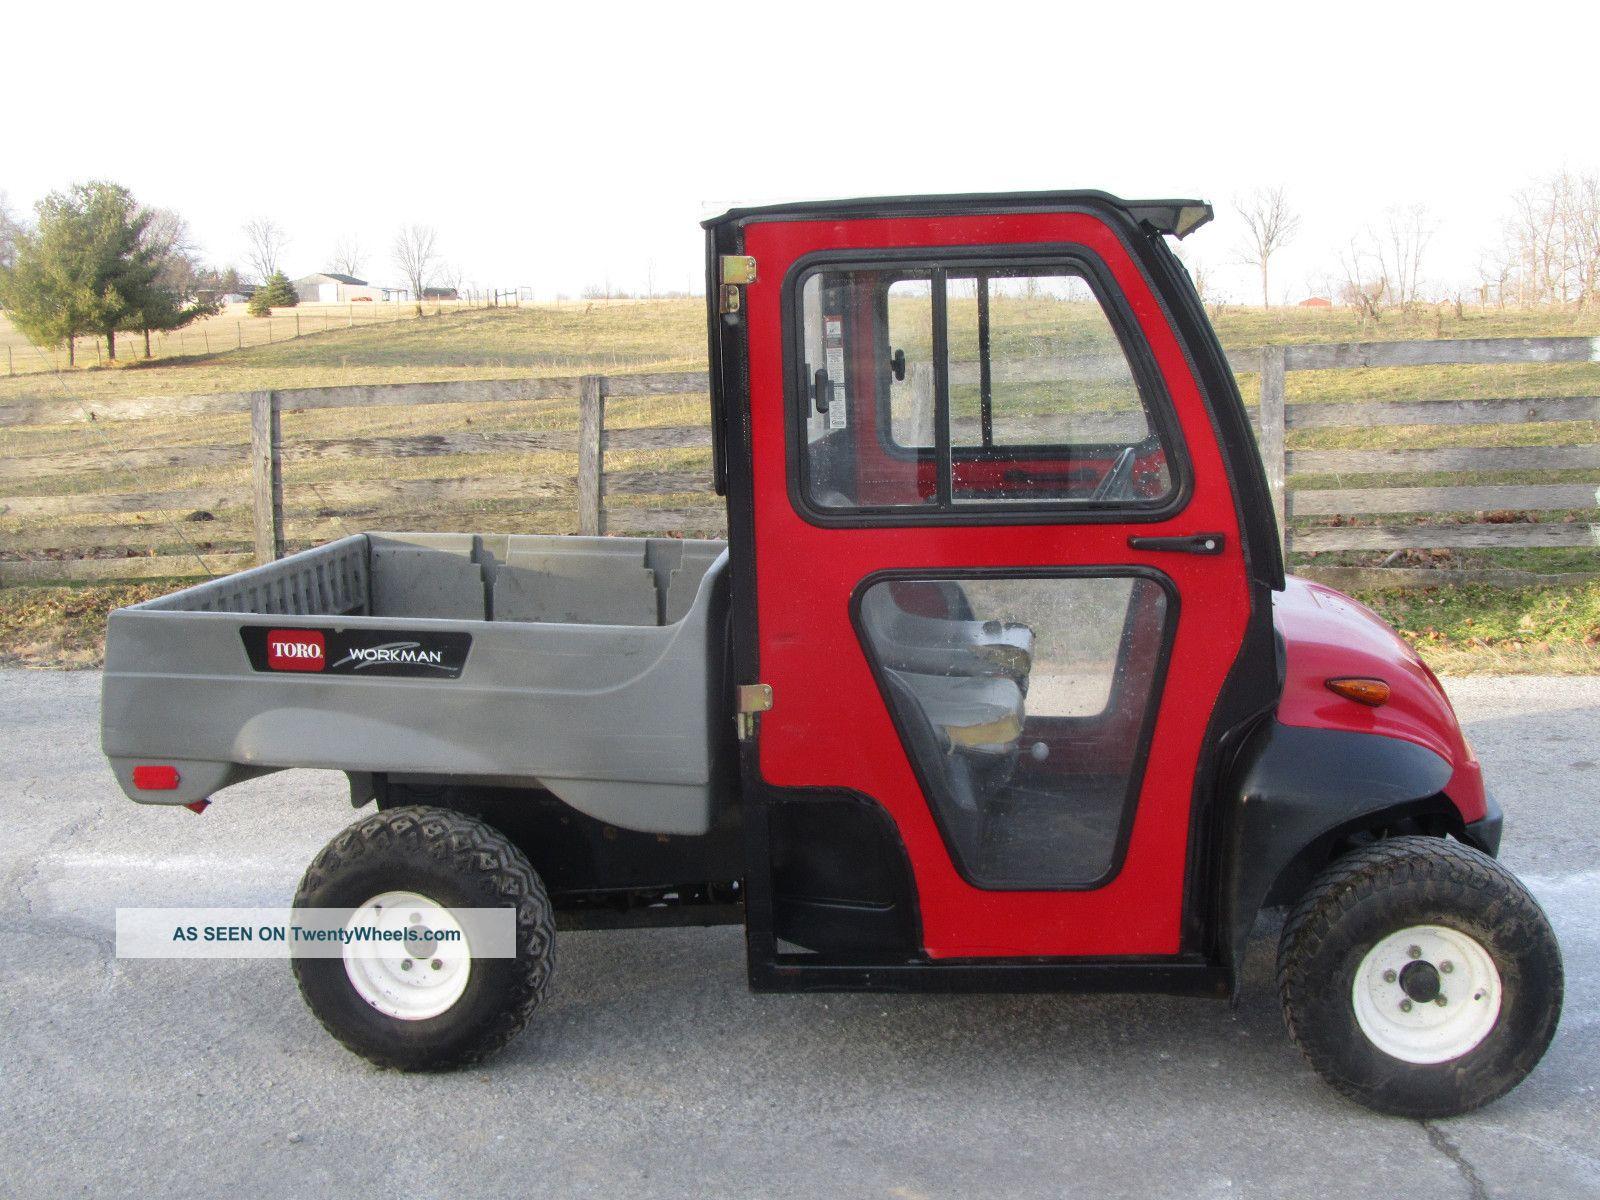 Toro Workman 1100 With Cab Utility Vehicles photo